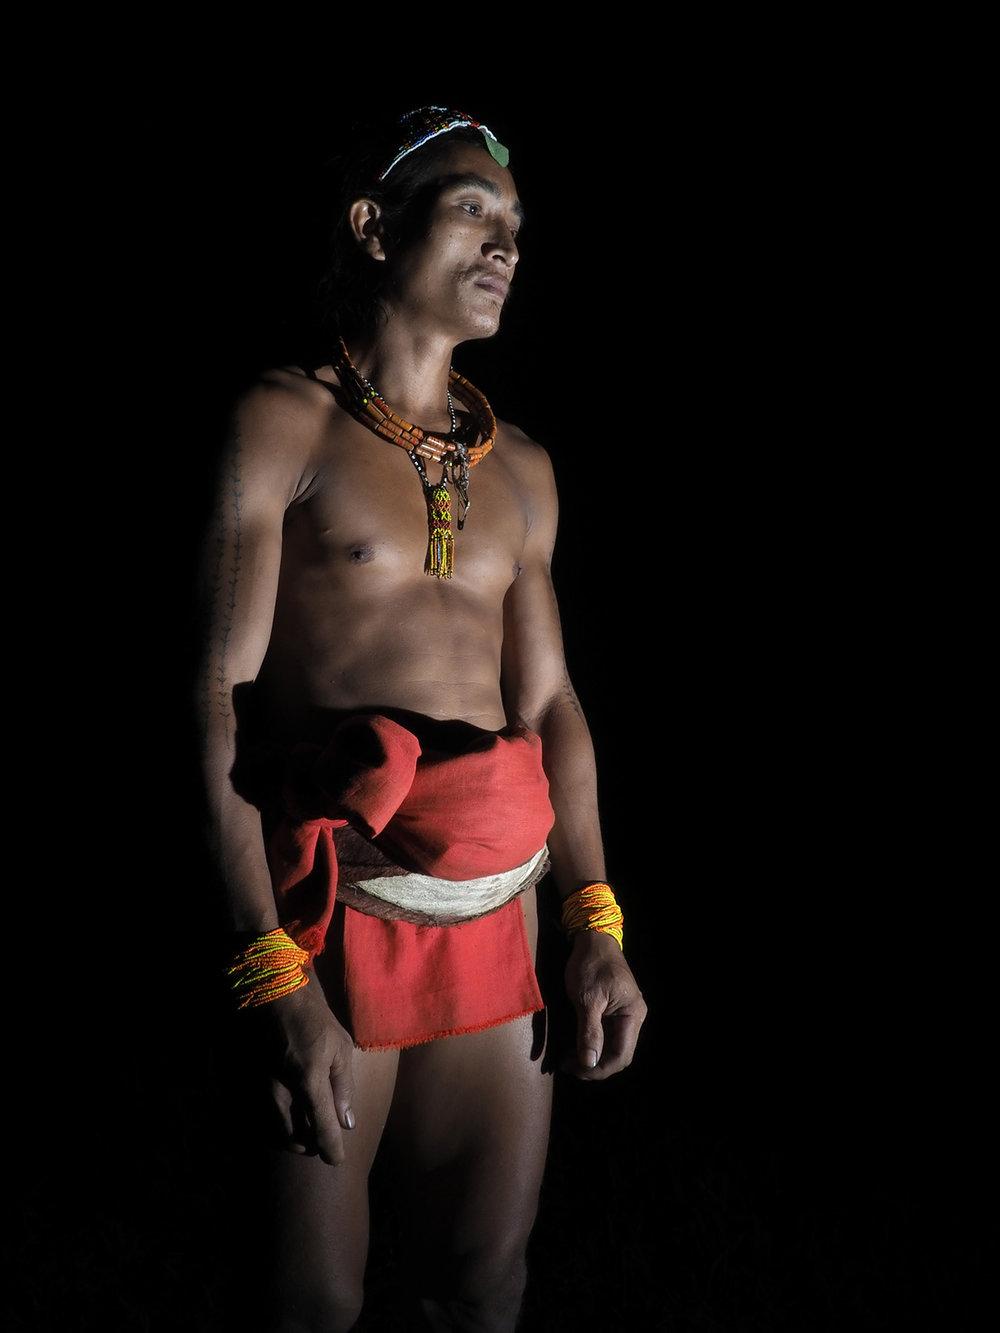 Ranjan_Ramchandani_Portriat of the Mentawai tribesman.jpg